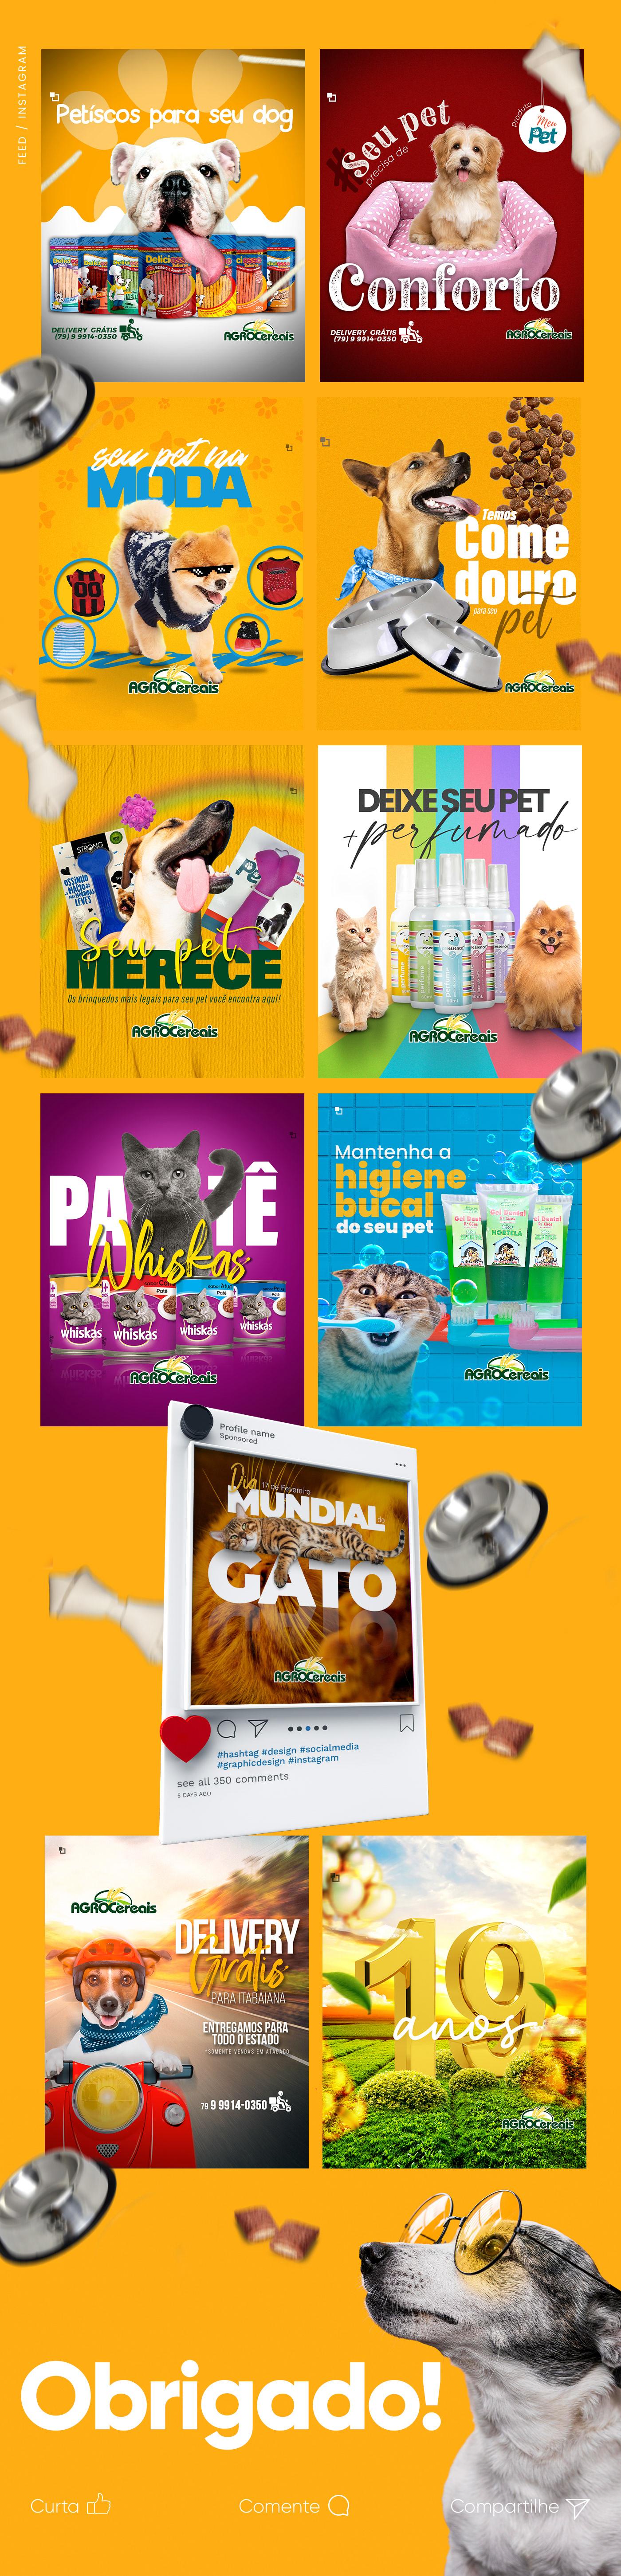 agropecuária animais facebook instagram marketing digital petshop photoshop rede social sergipe social media